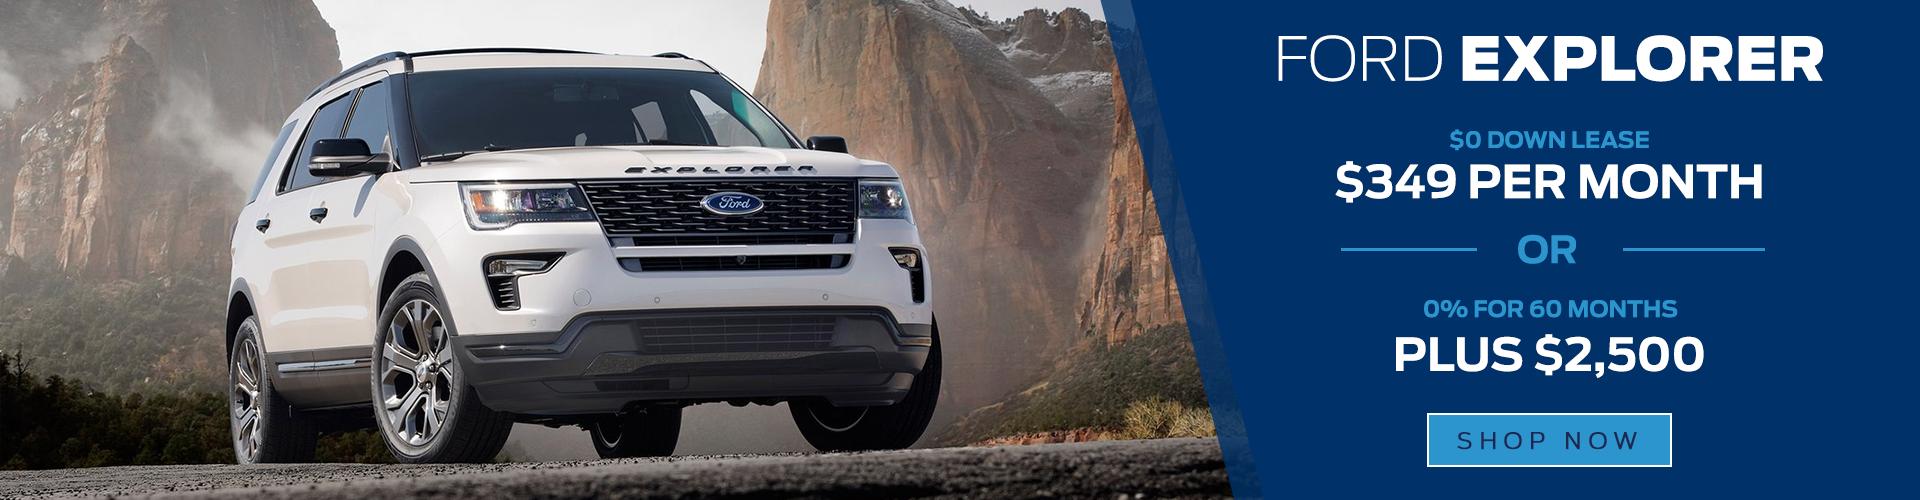 2018 Ford Explorer specials